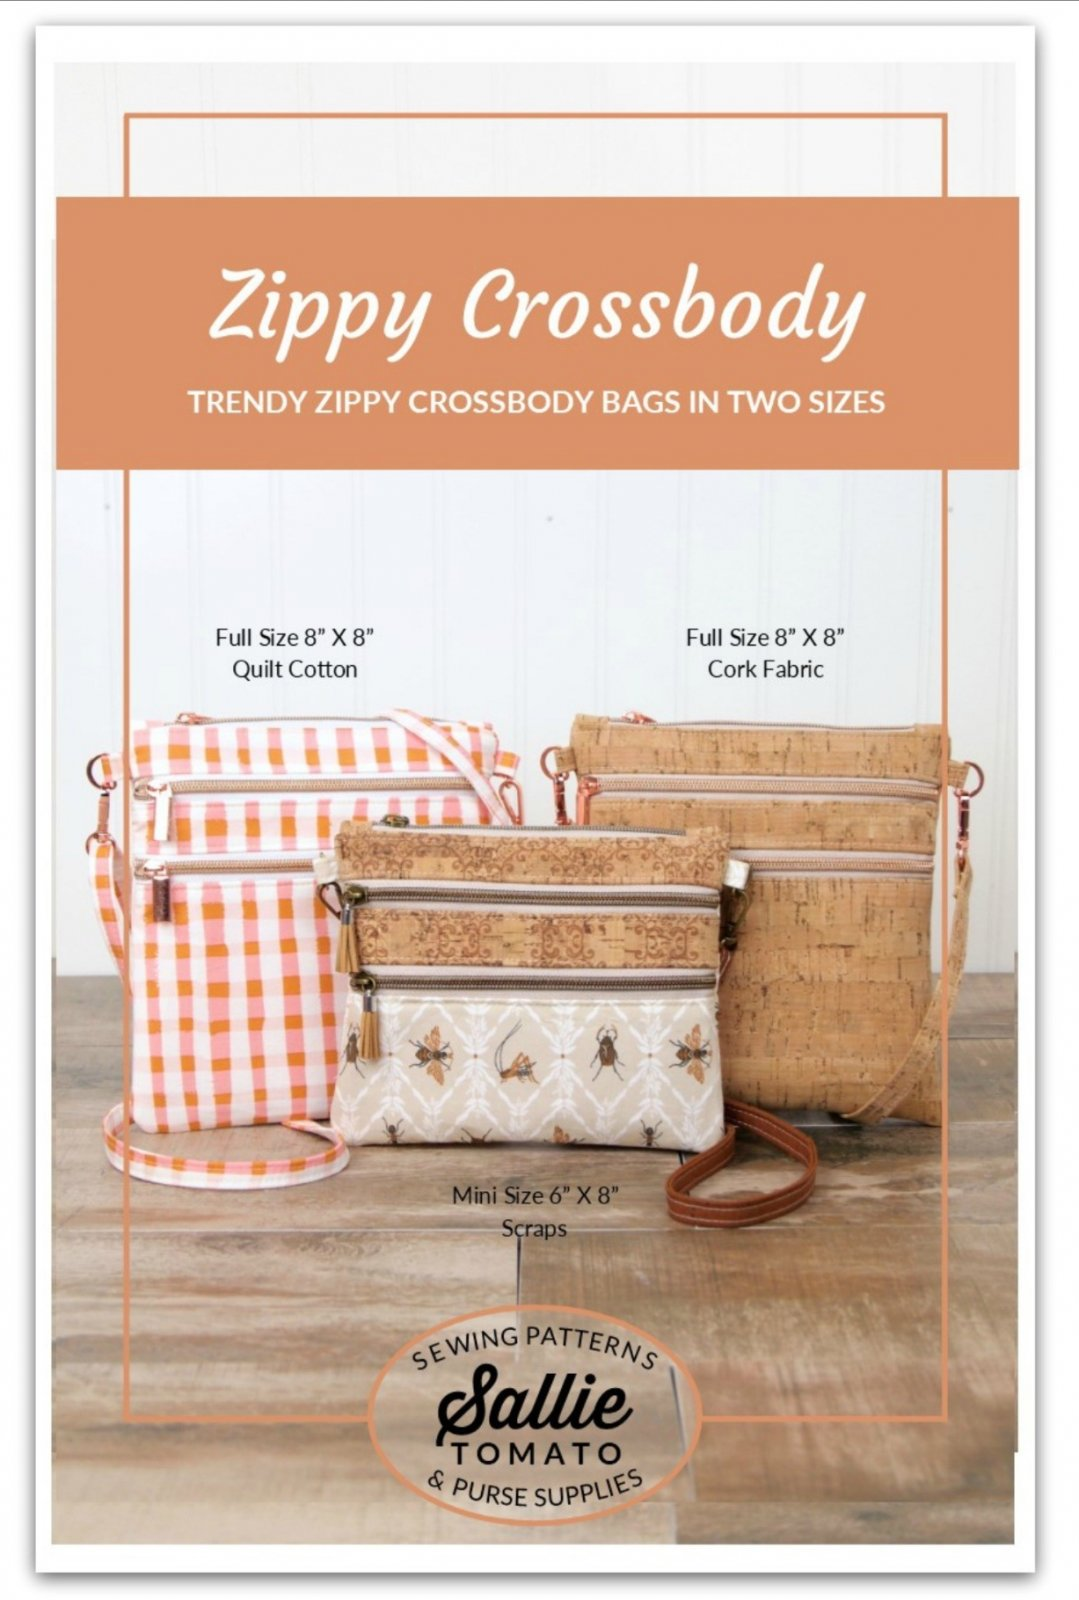 Zippy Crossbody